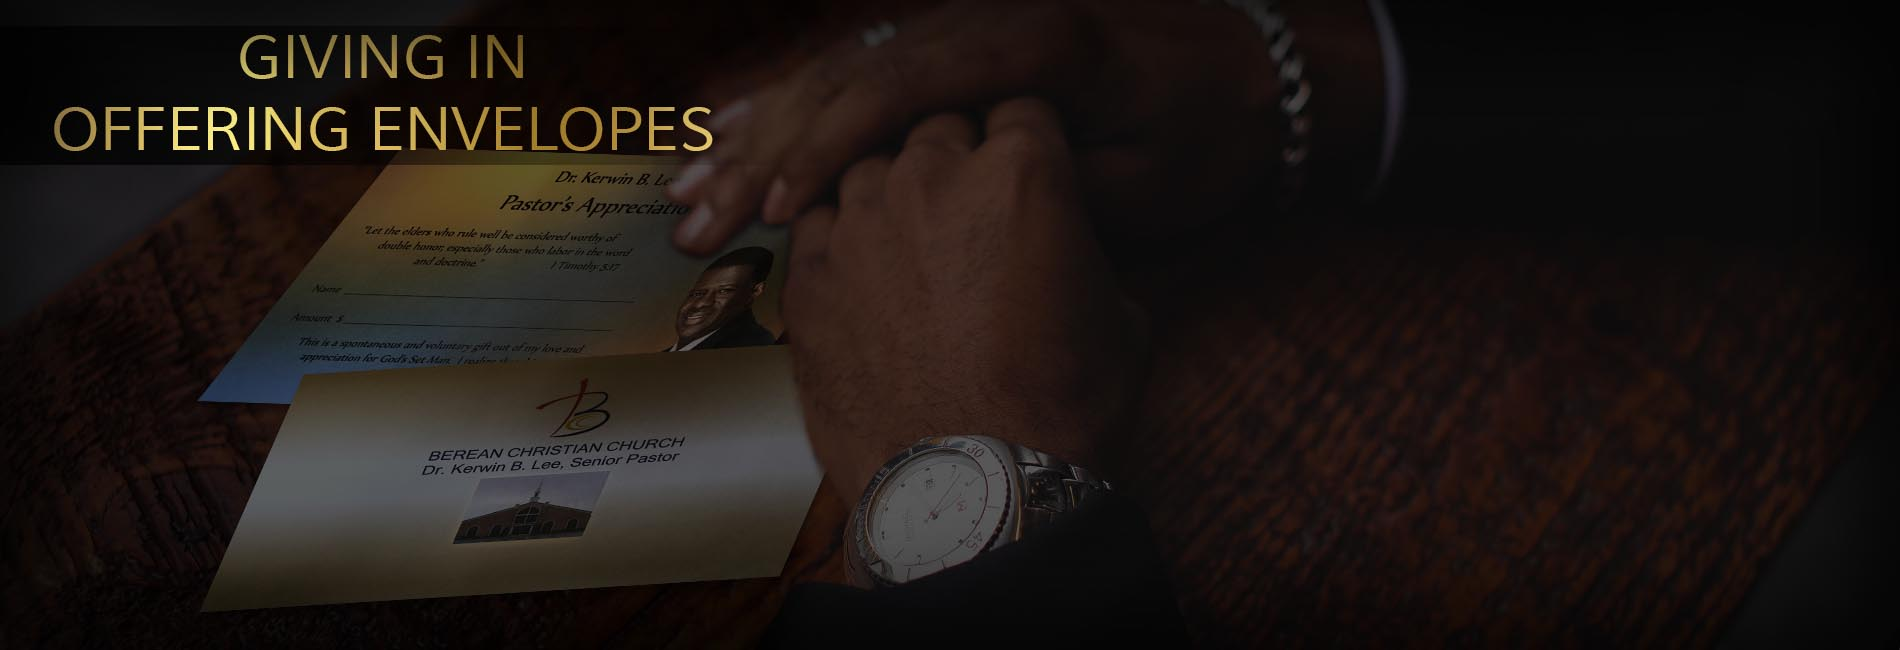 berean-envelopes